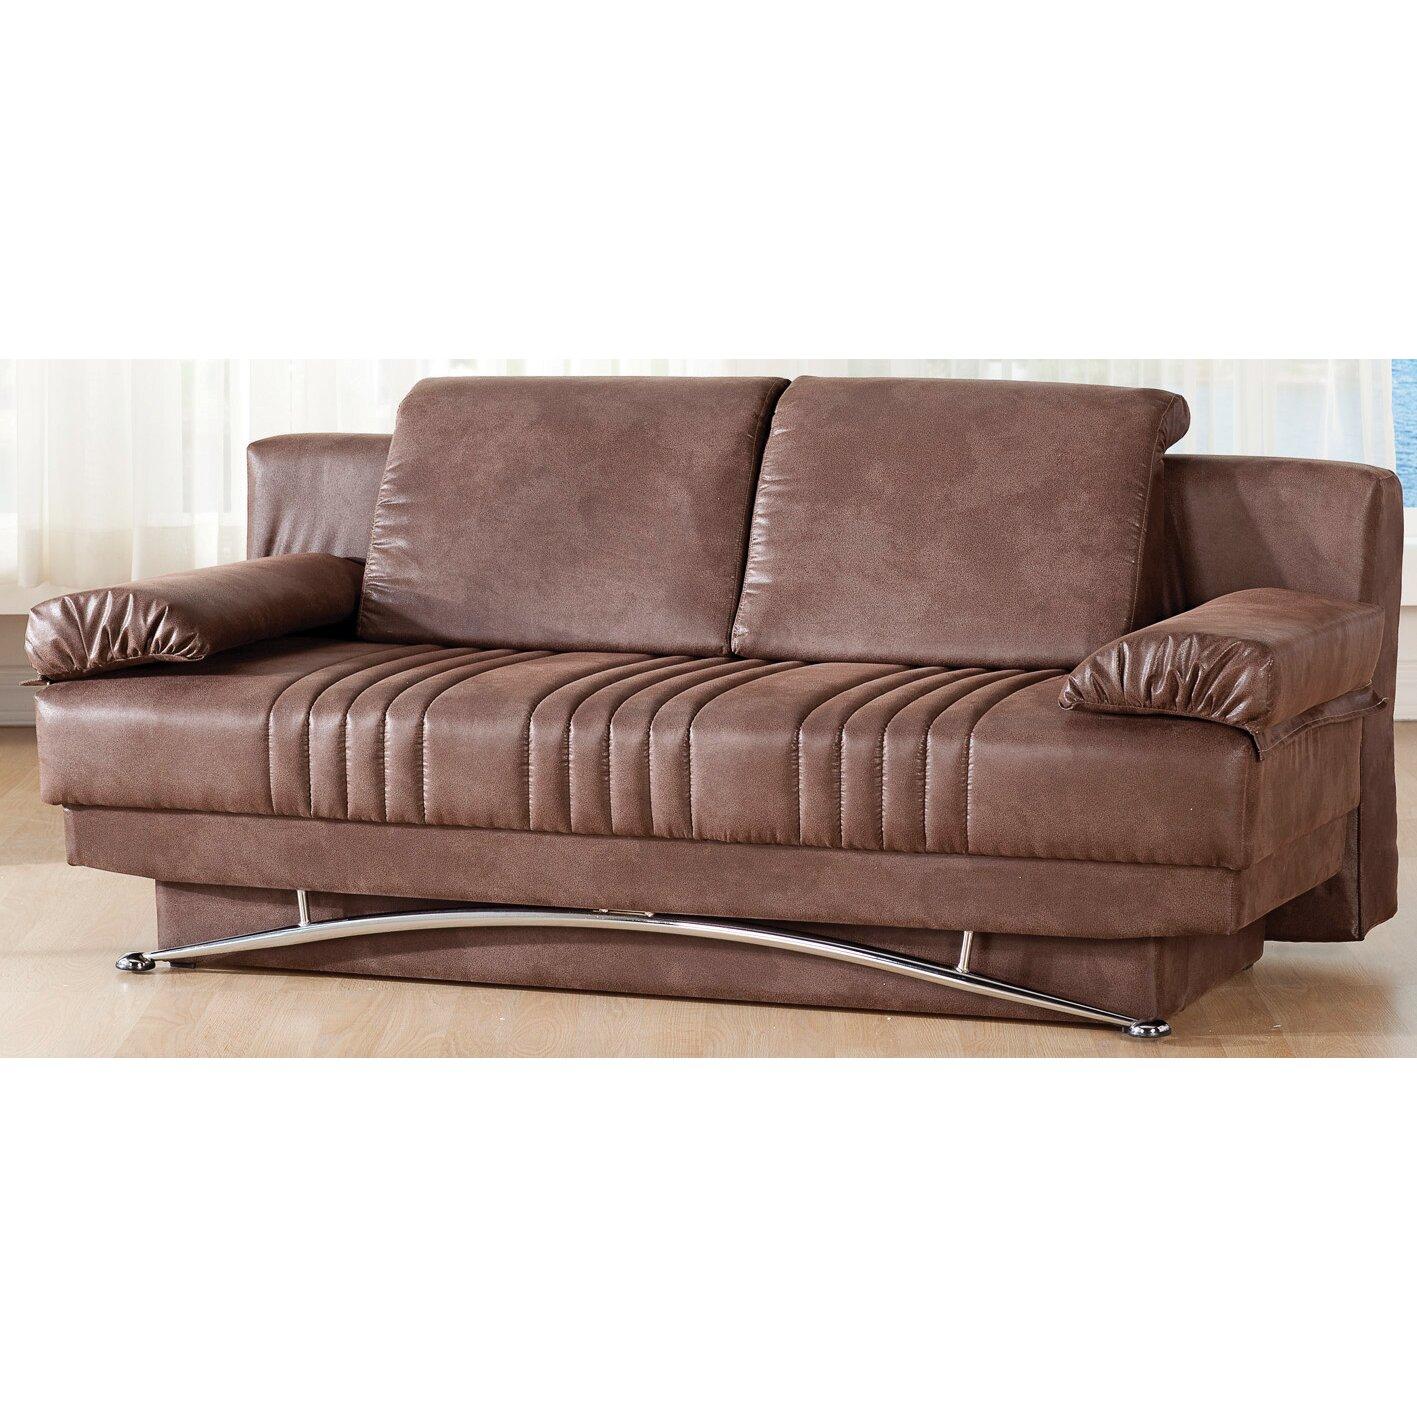 Istikbal Sofa Bed